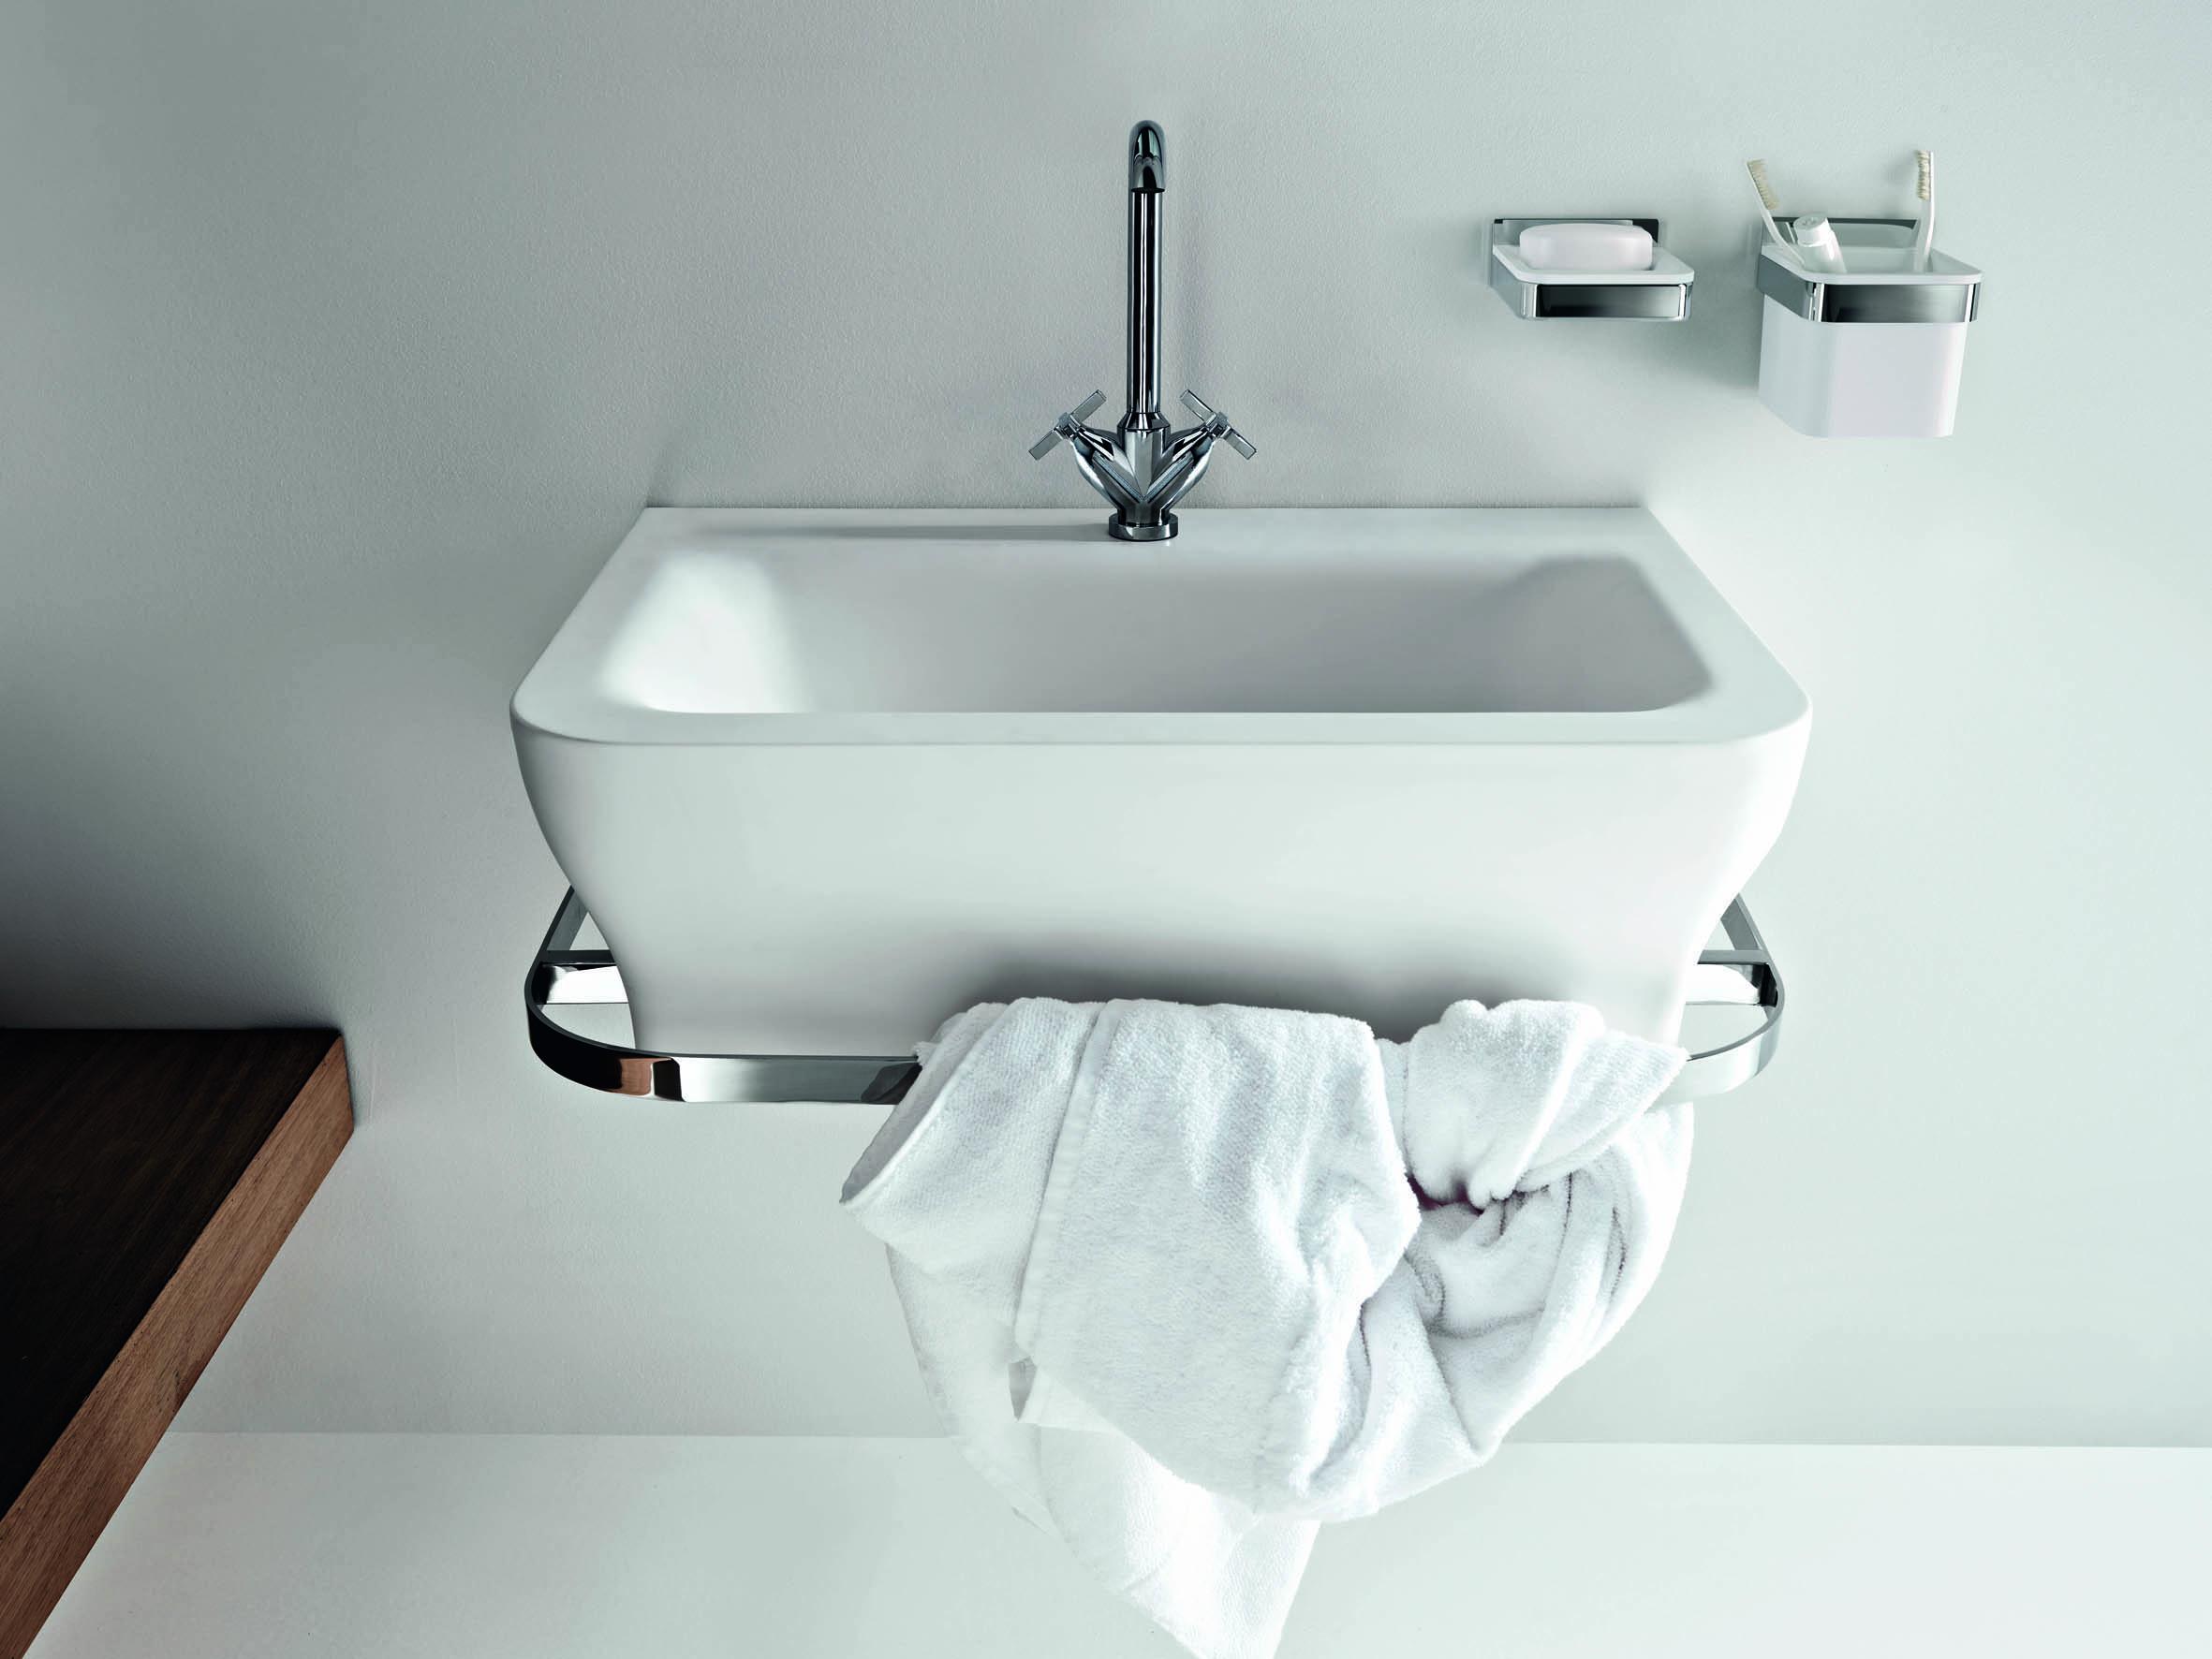 ... baño Agape · Lavabos modernos de la marca italiana Agape · Lavabo con  toallero incorporado ... 34a800c996b3